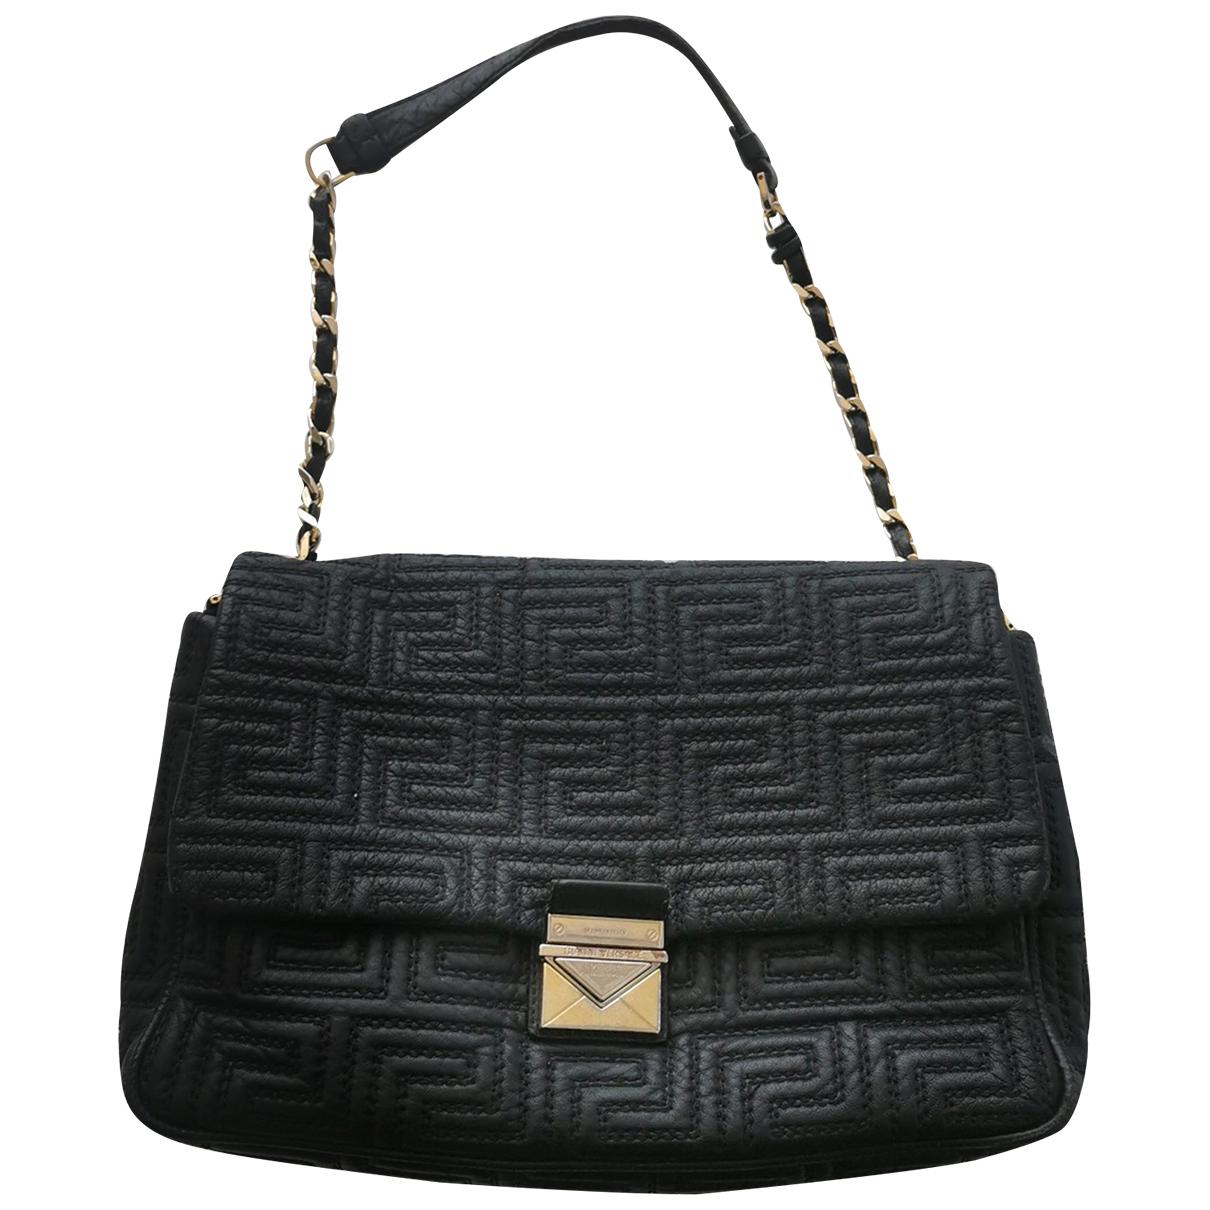 Gianni Versace \N Handtasche in  Schwarz Leder